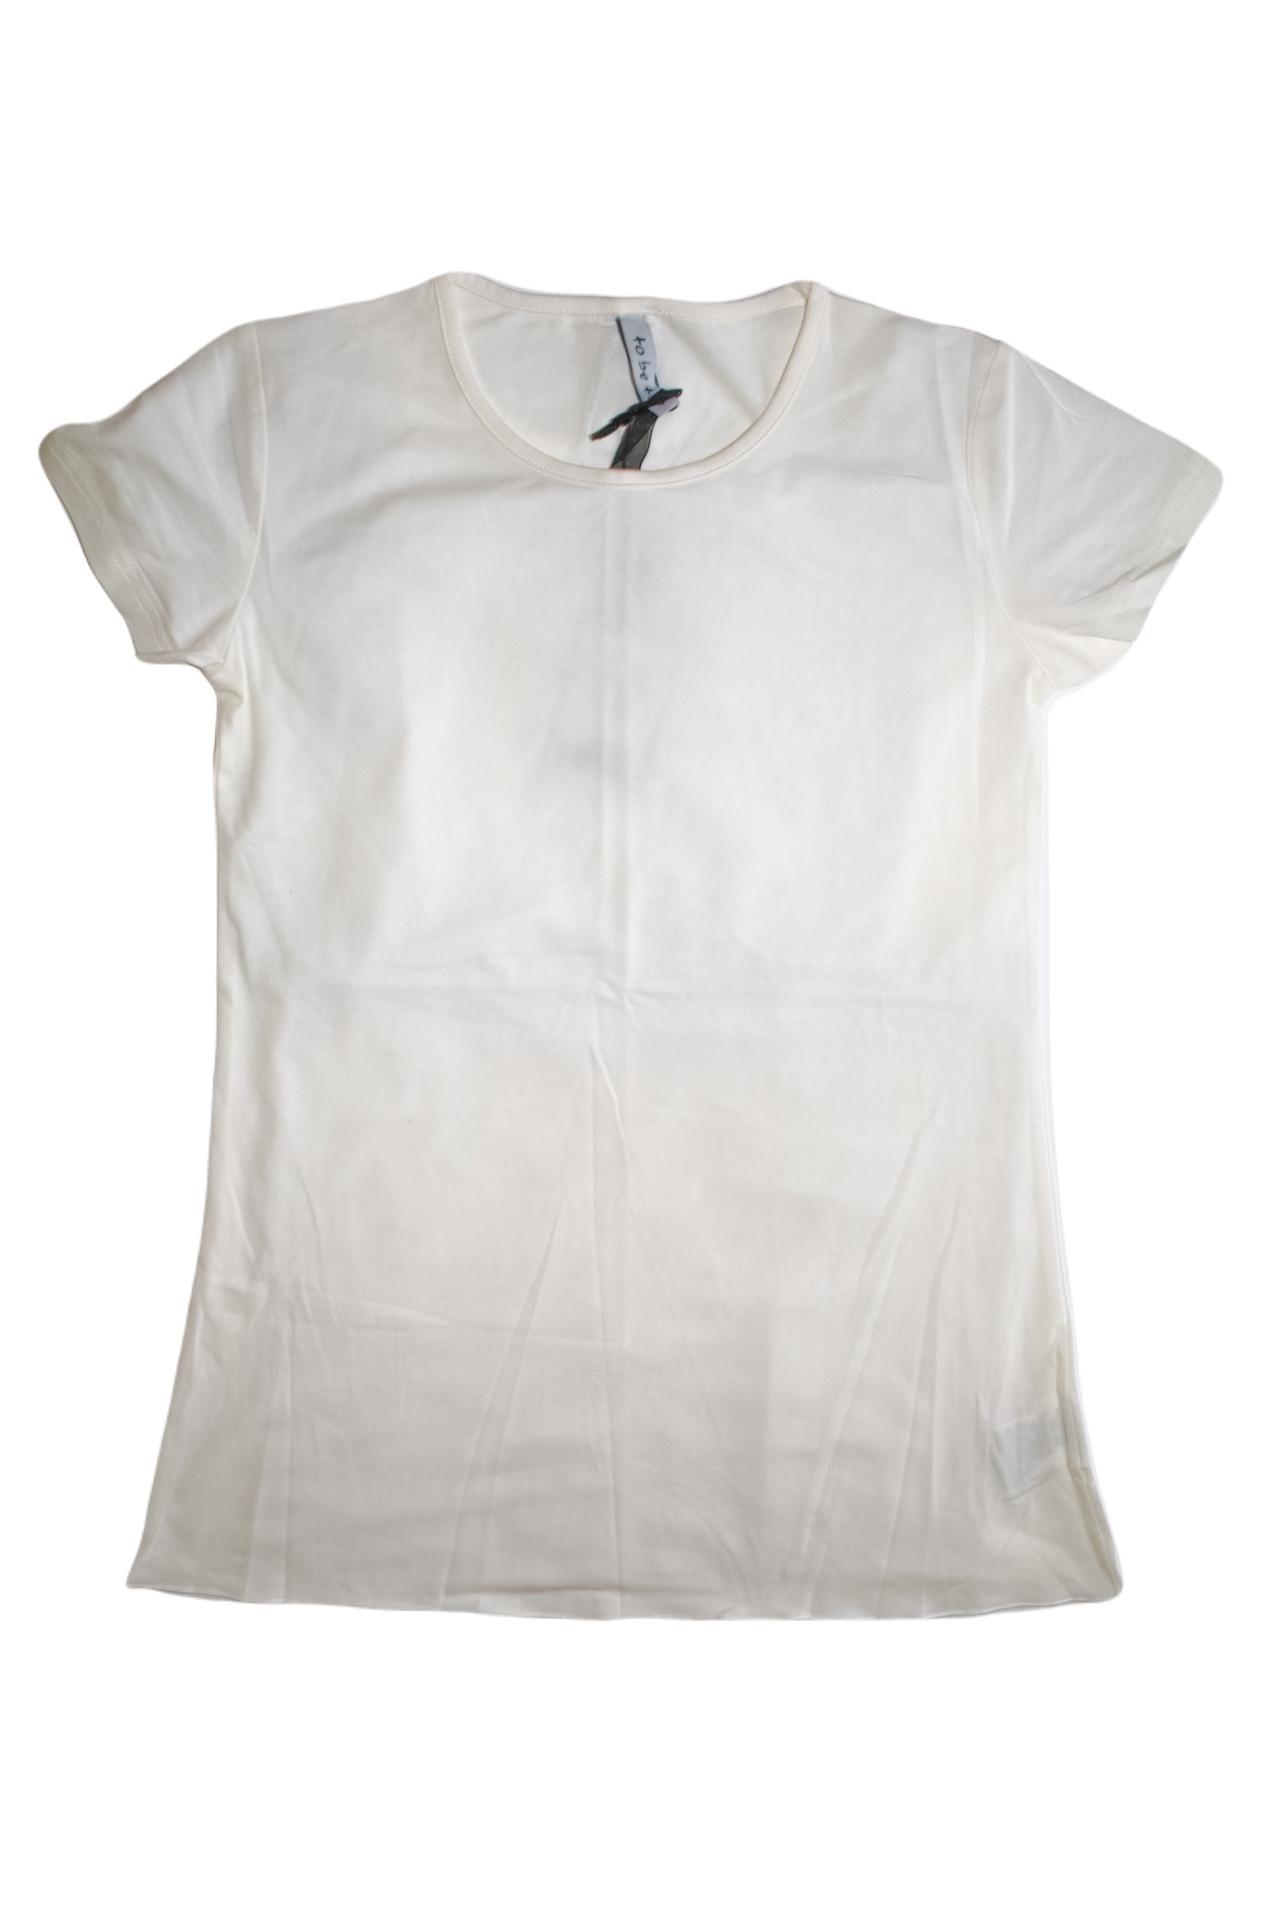 copy of T-shirt - 1